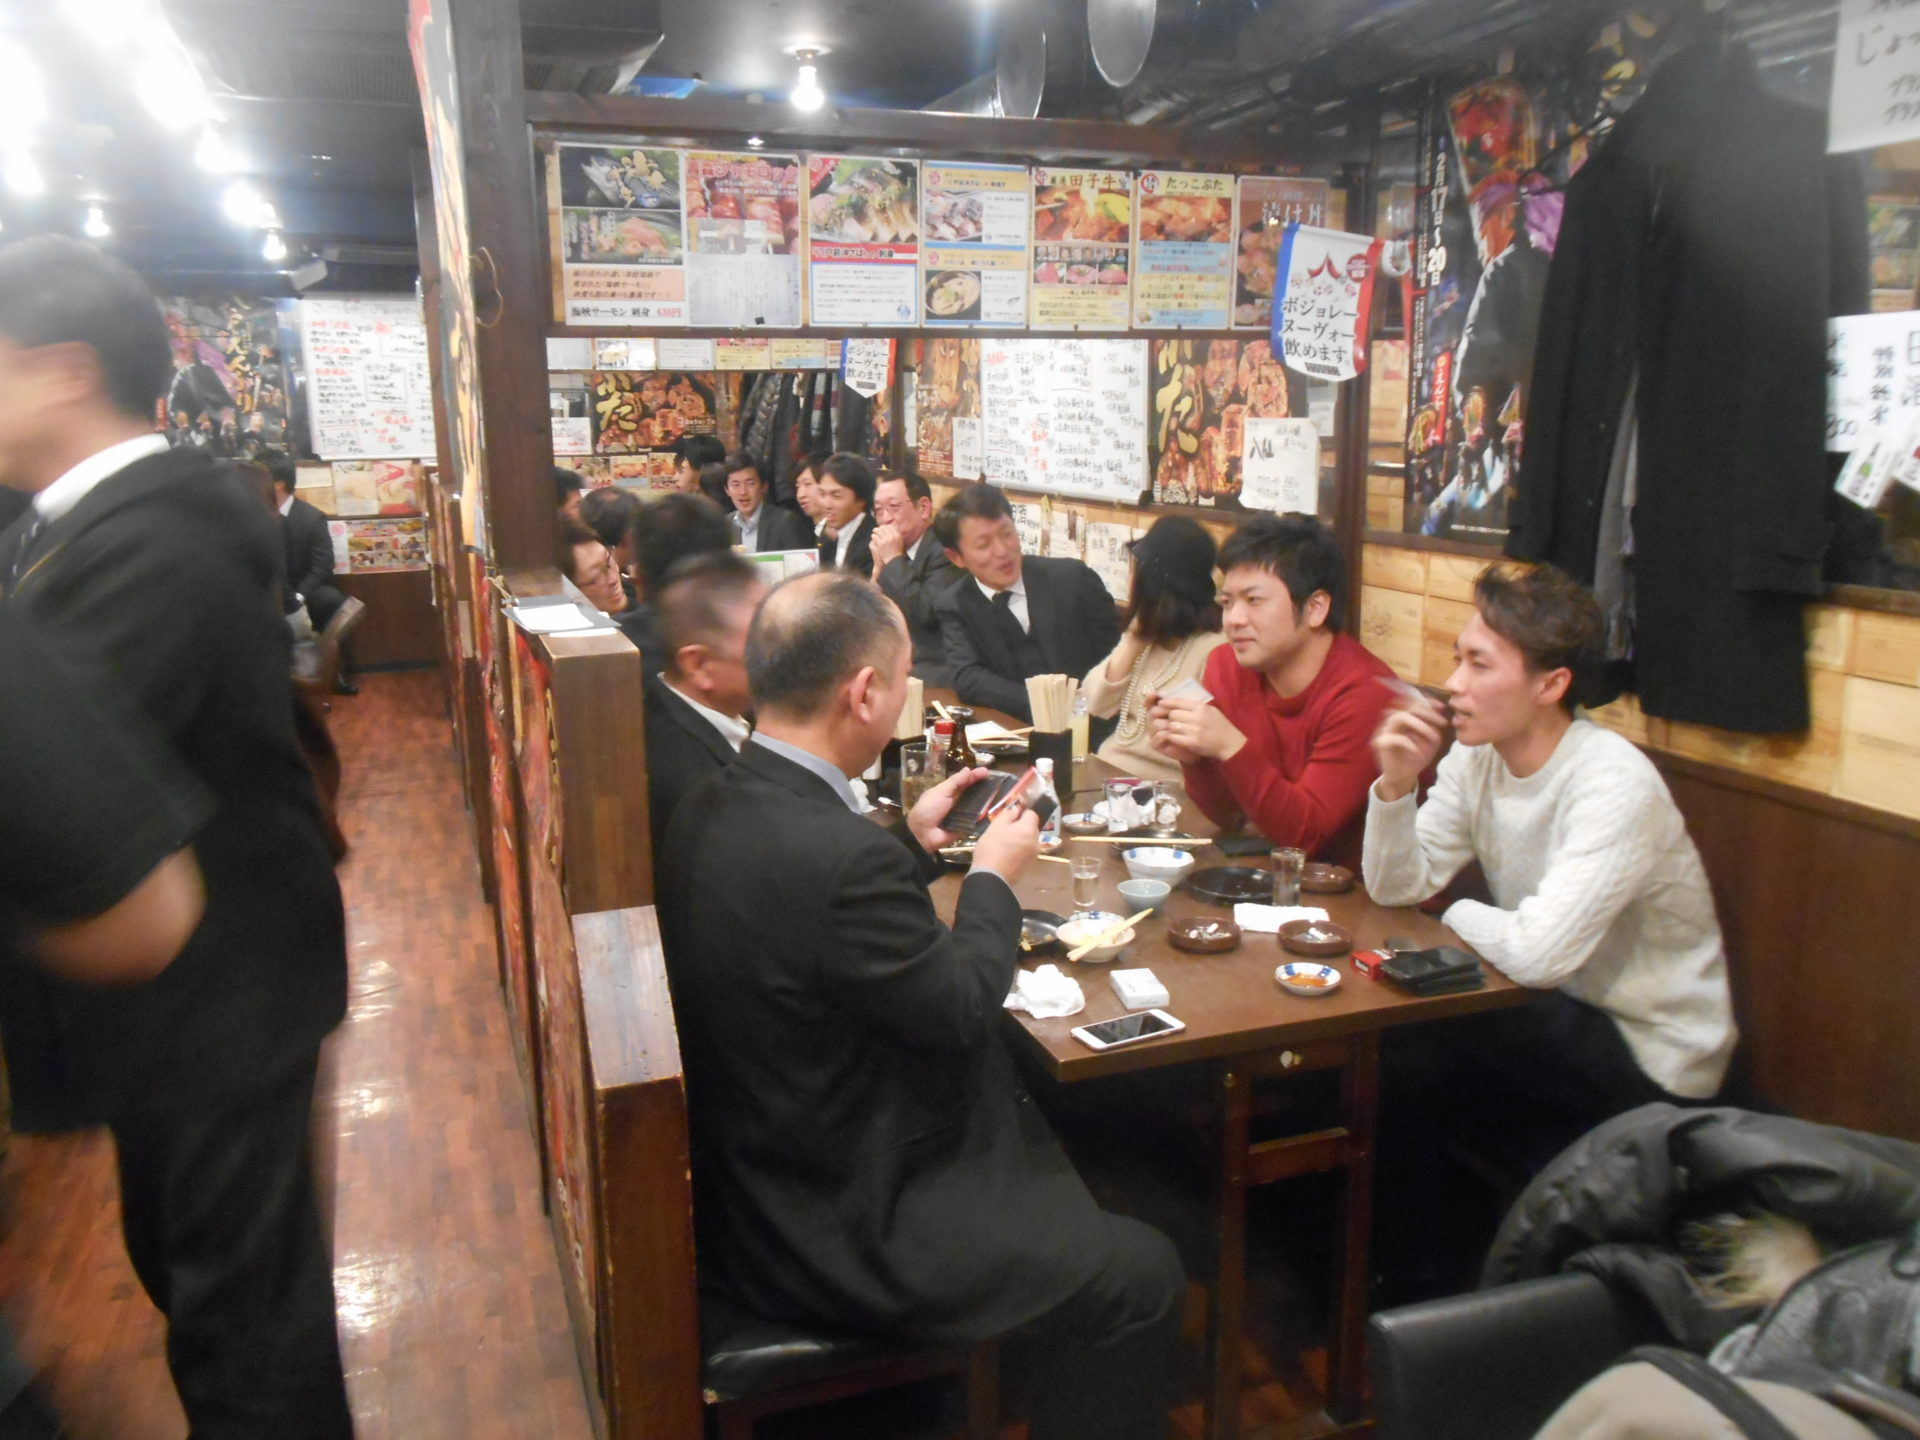 DSCN0611 1920x1440 - 2015年12月21日(月) AOsuki忘年会開催しました。